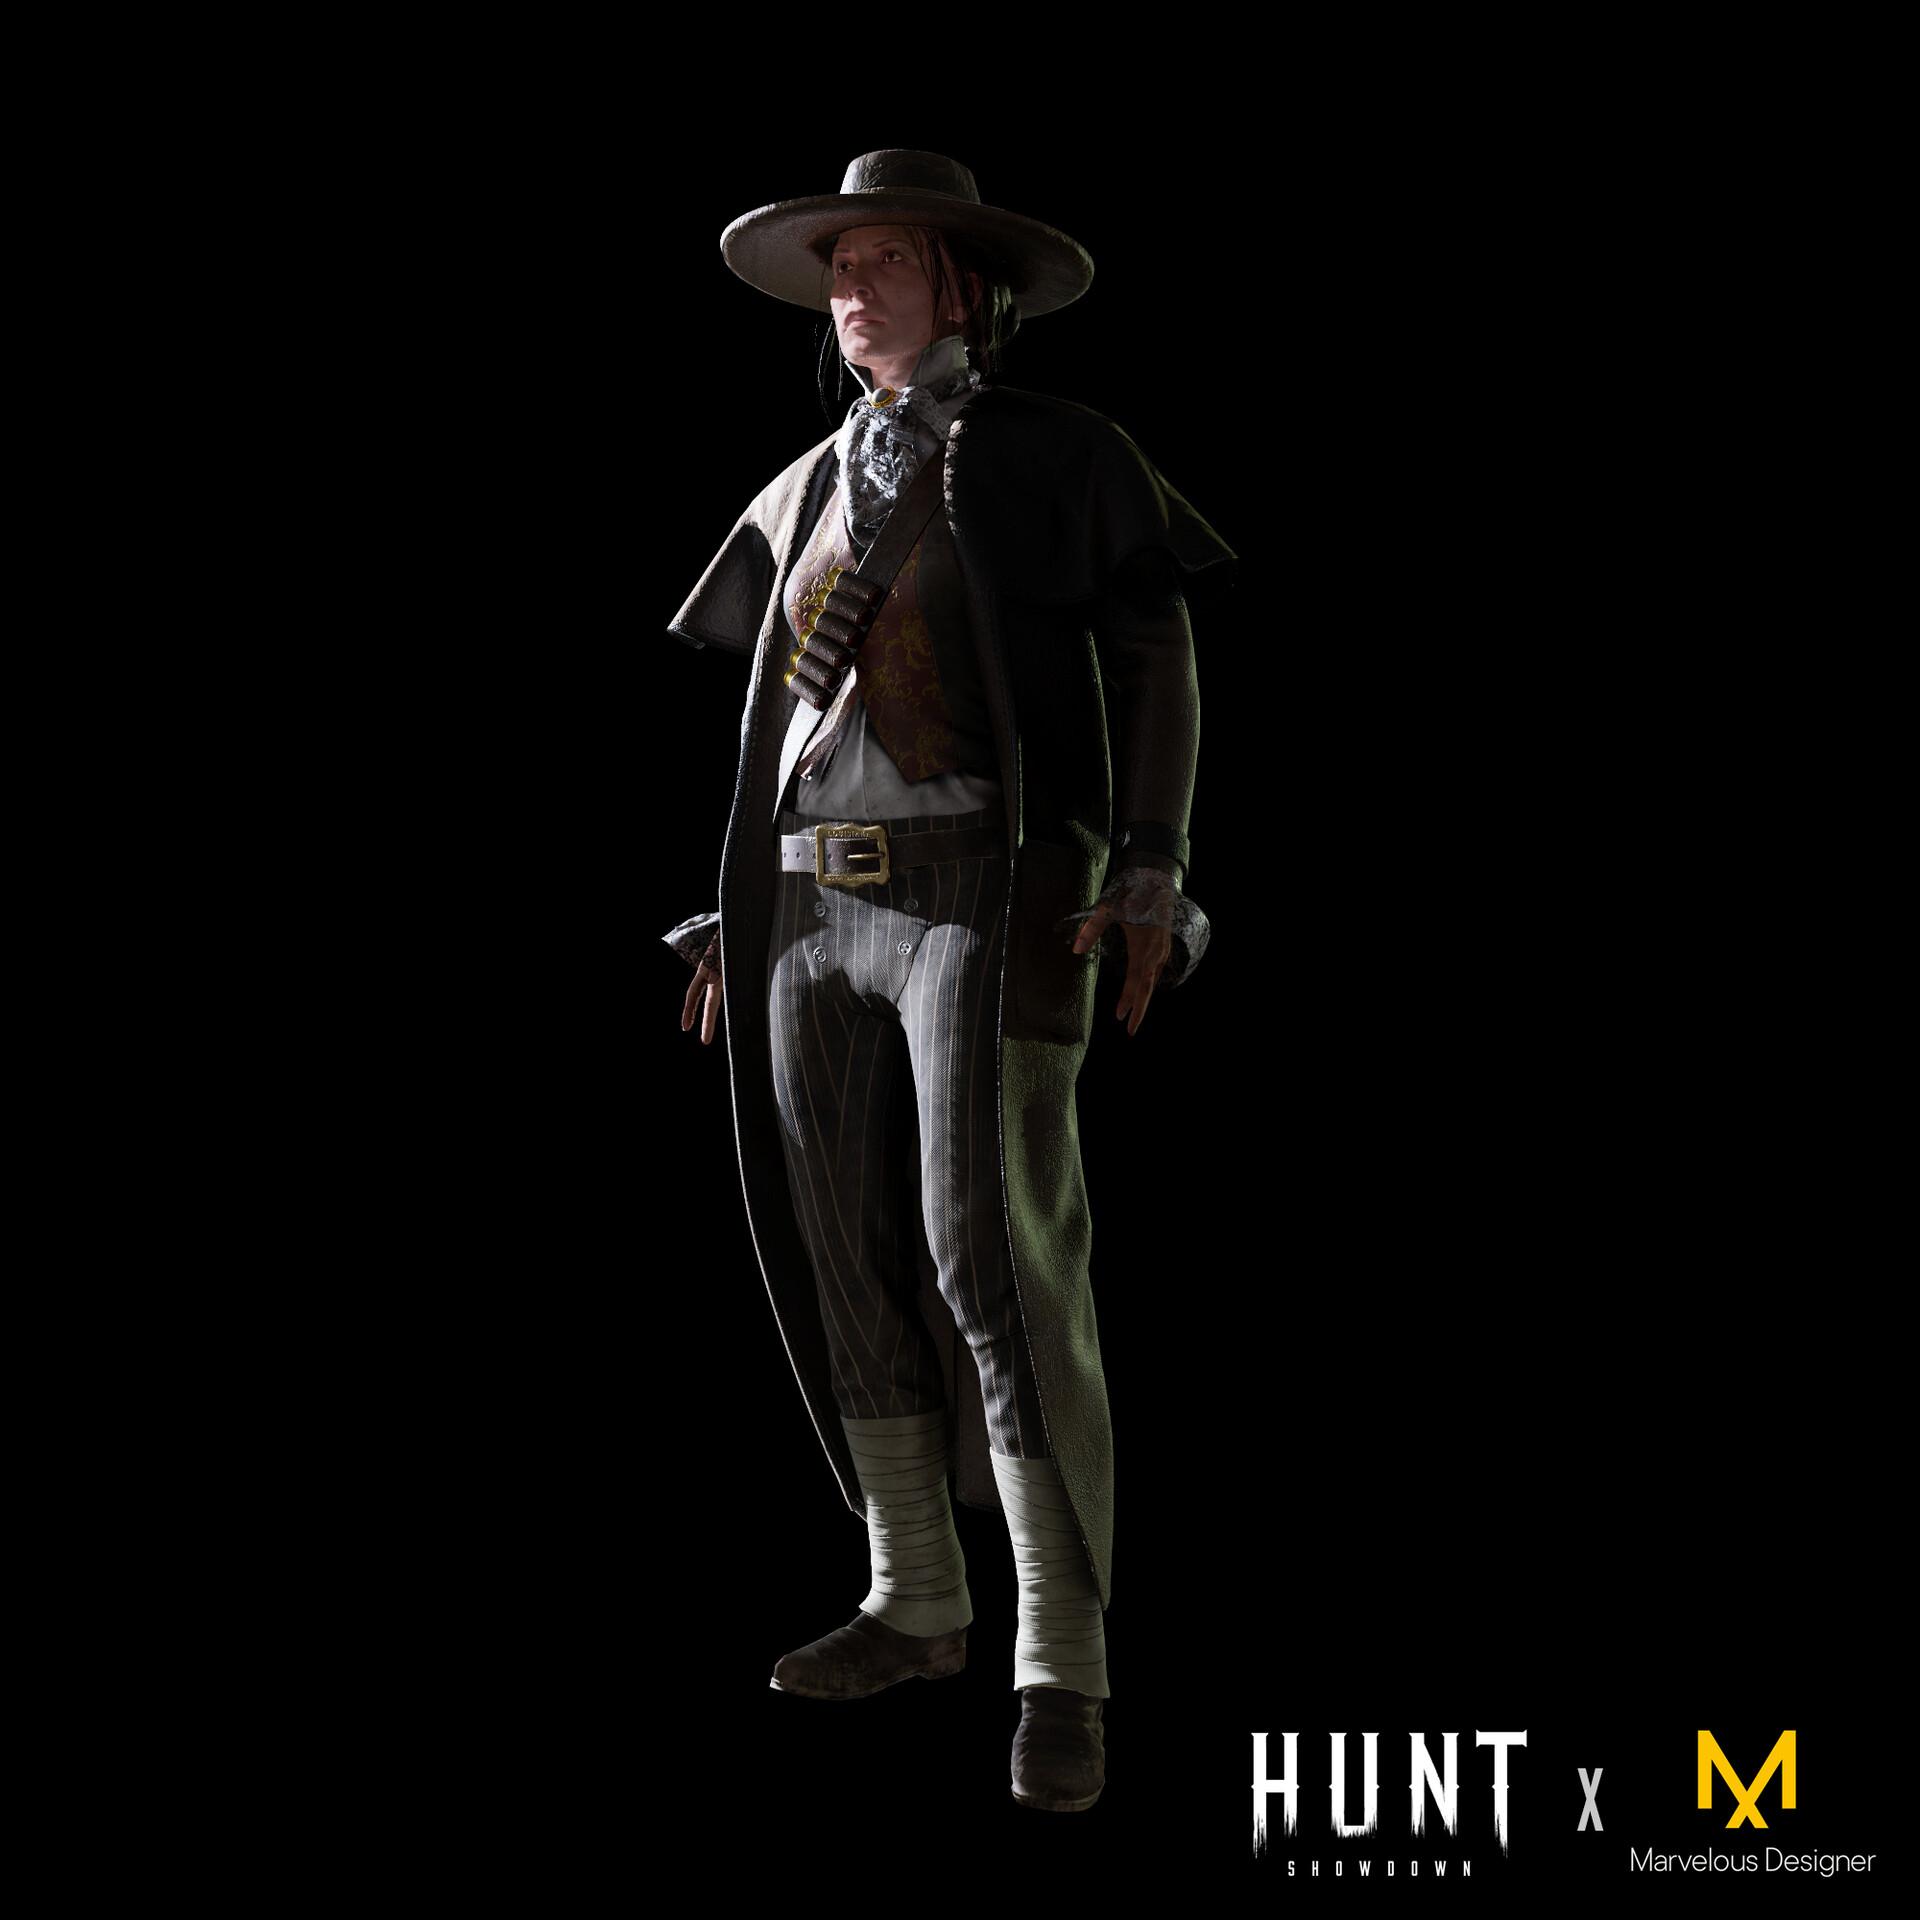 Hunt Showdown - Legendary Hunter Outfit